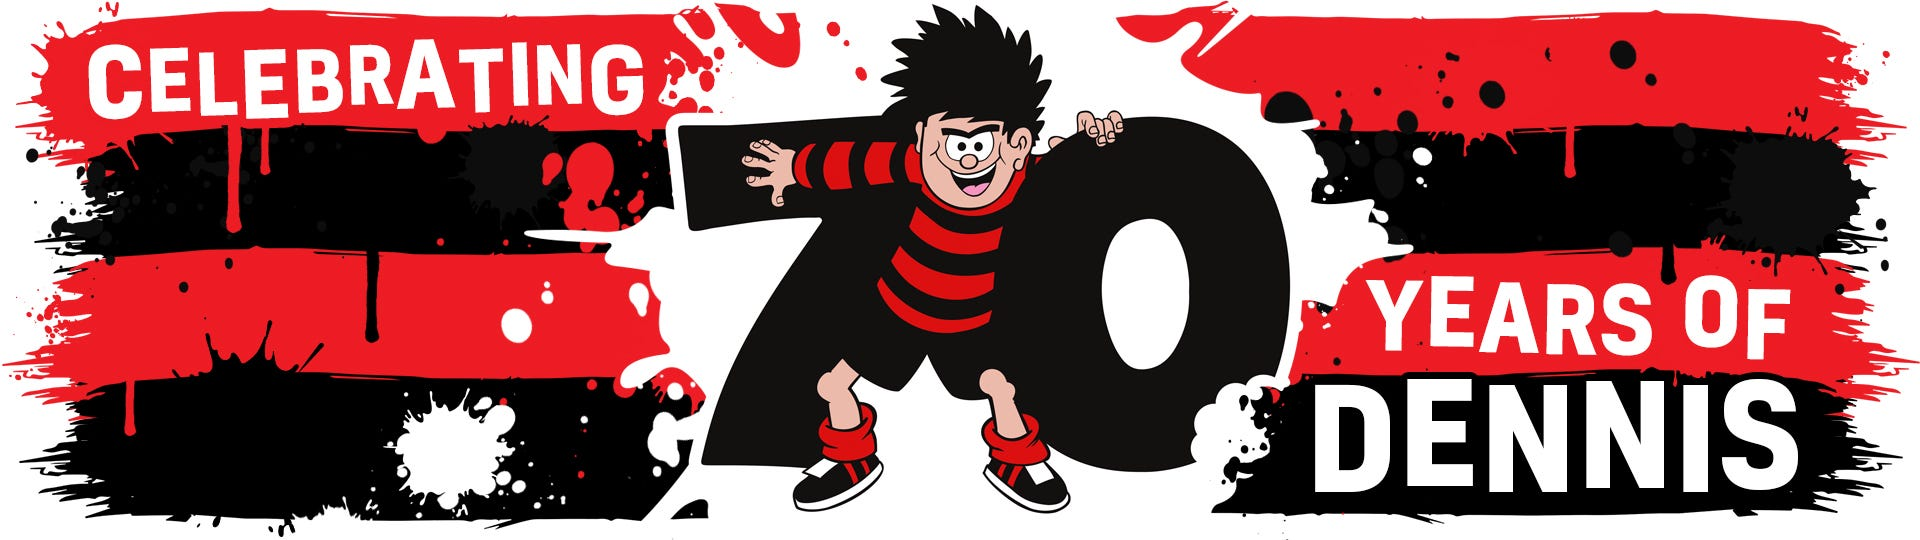 Dennis's 70th